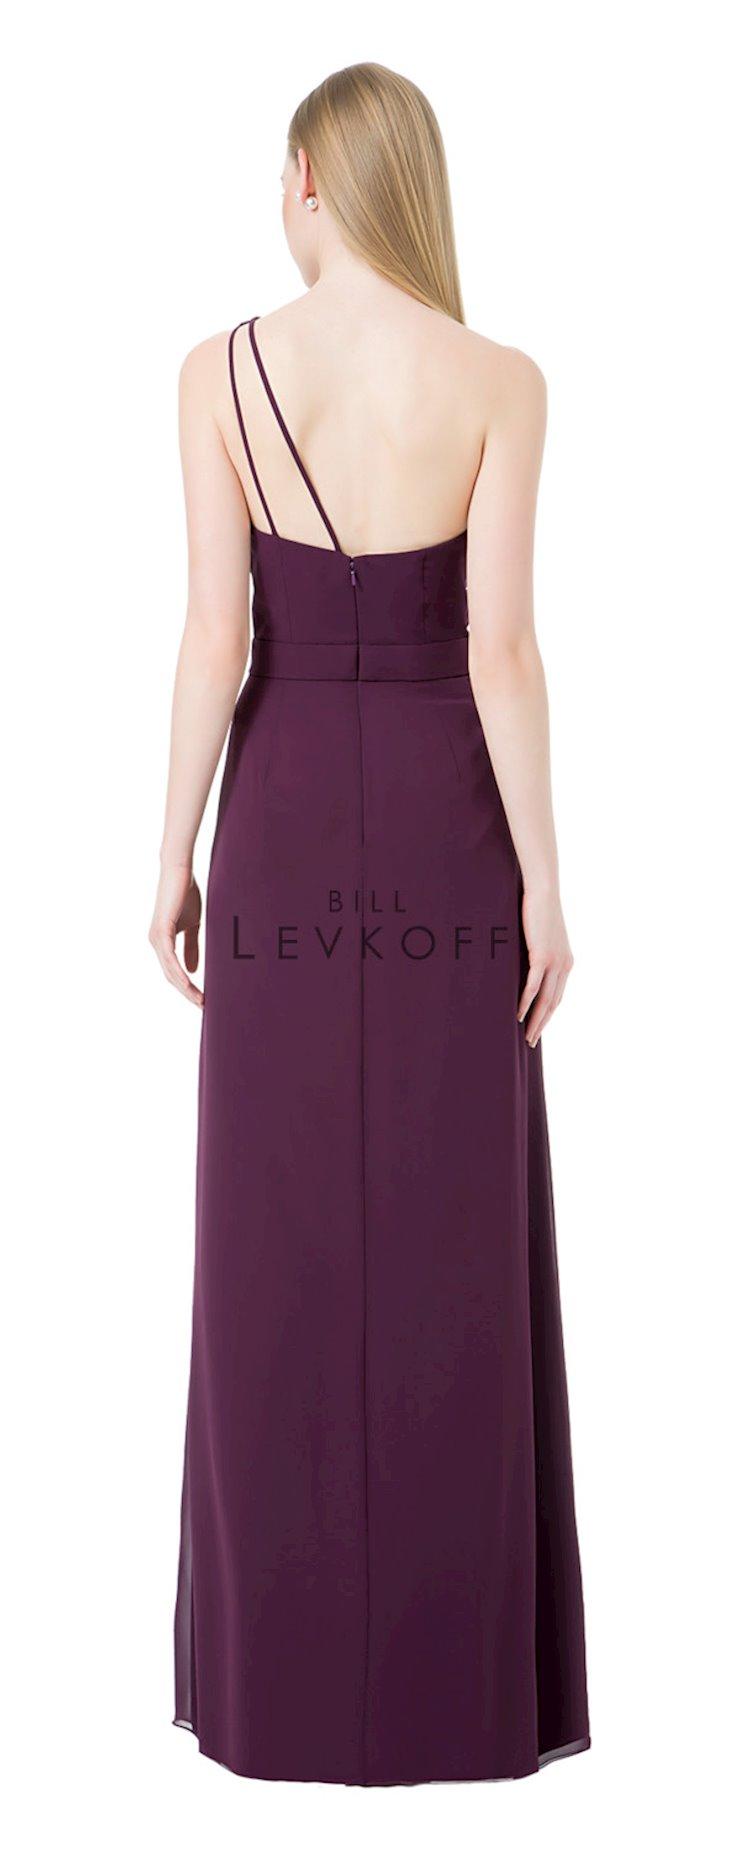 Bill Levkoff Style 1203